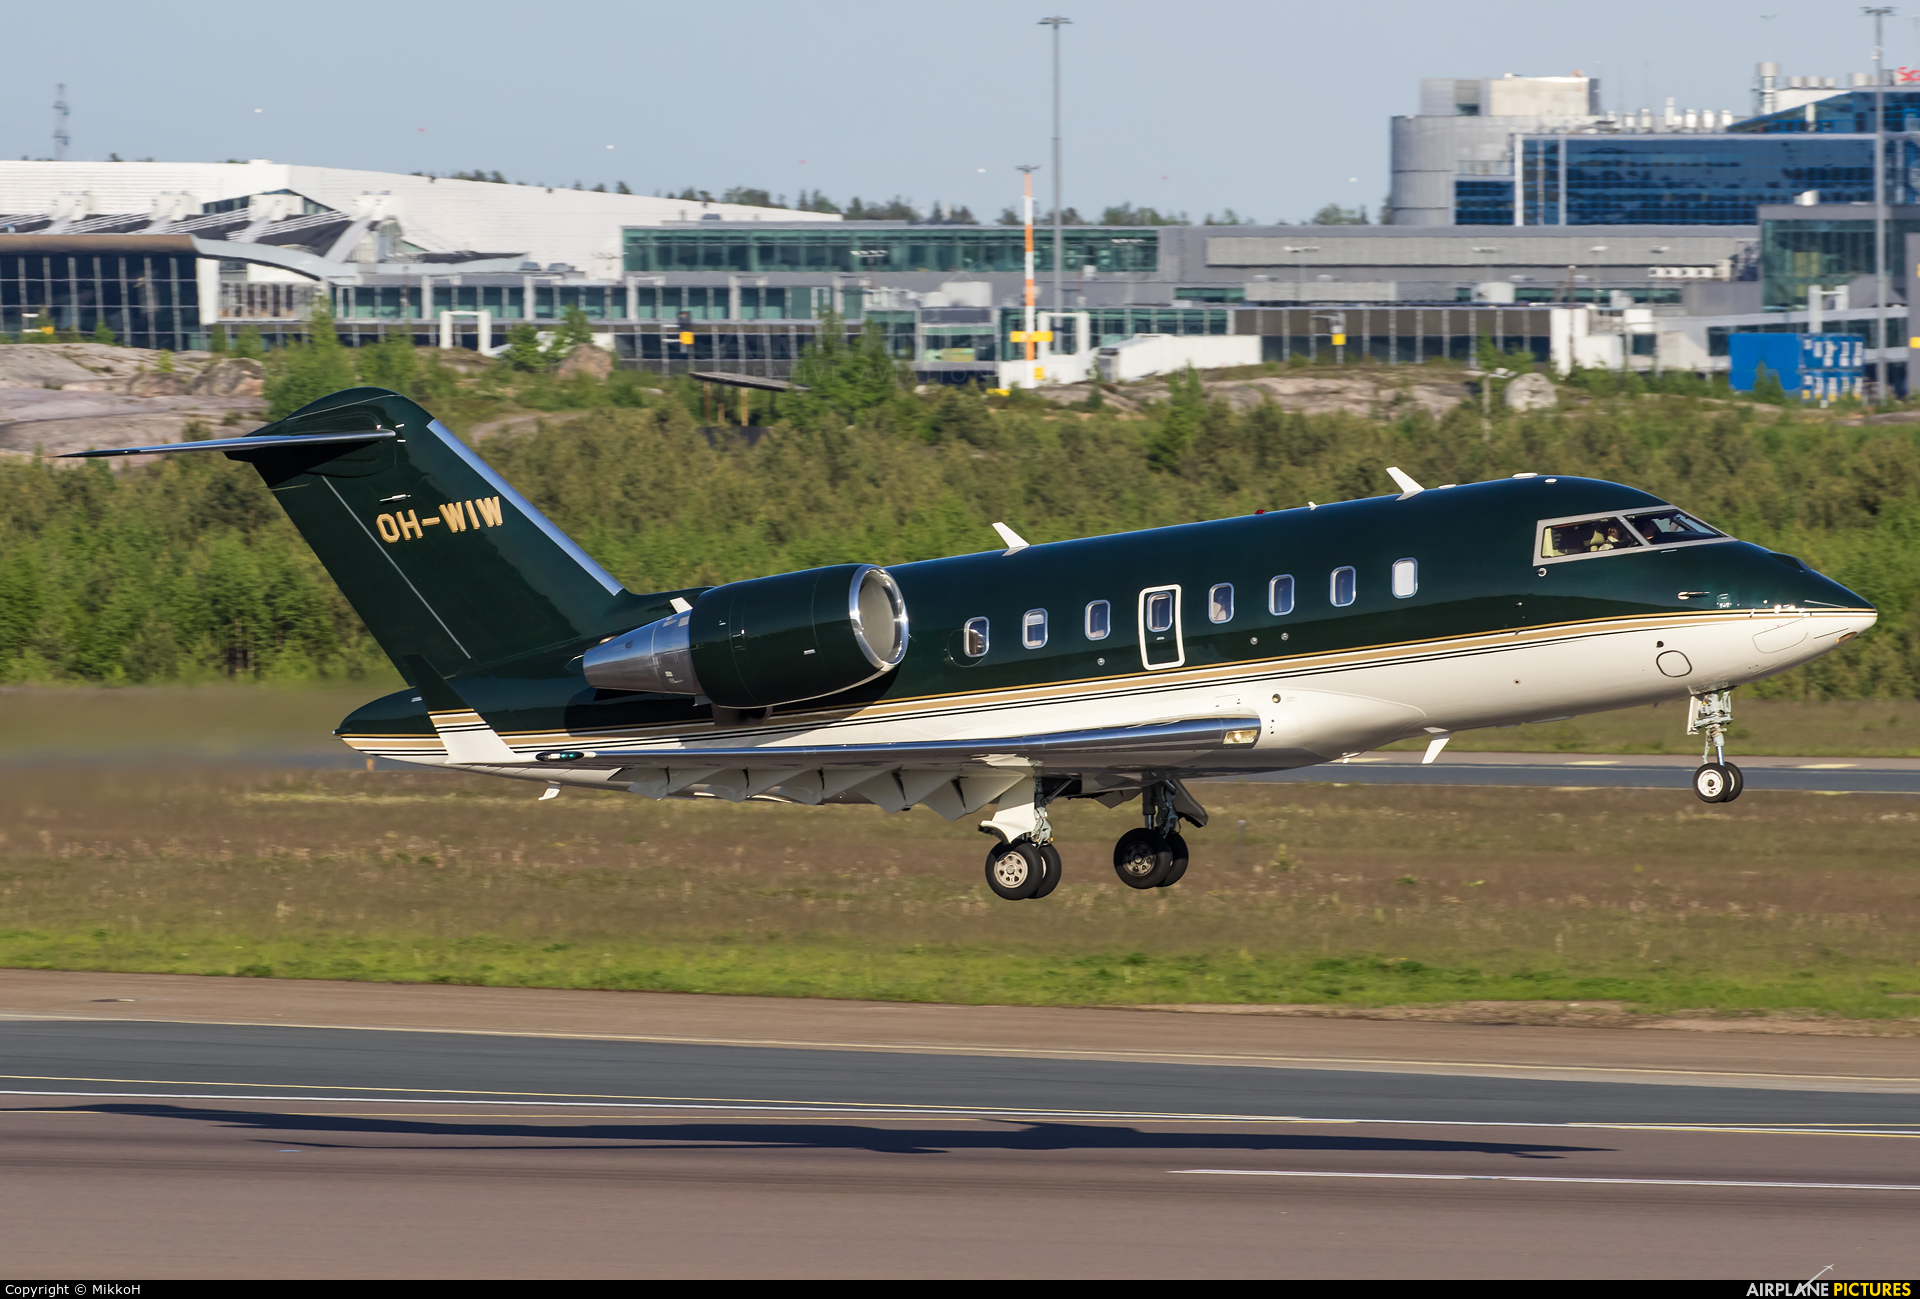 Jetflite Oy OH-WIW aircraft at Helsinki - Vantaa